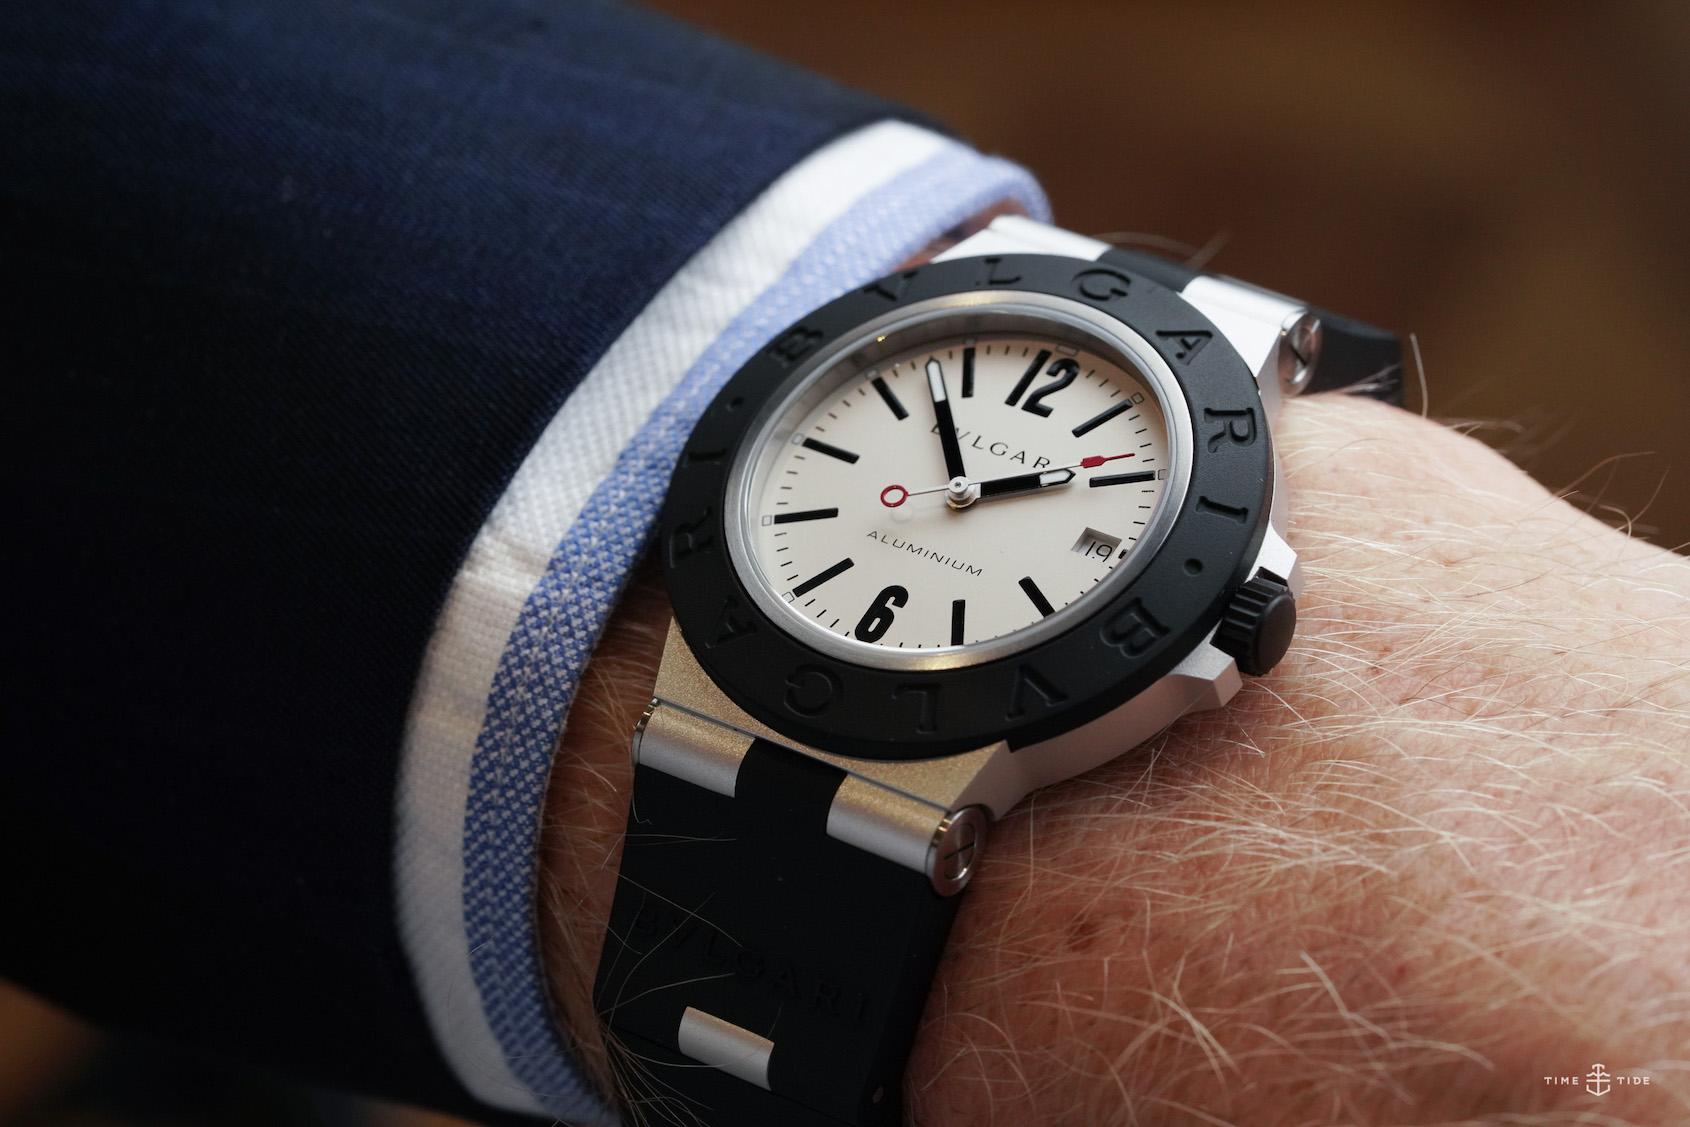 Redefining luxury leisure with the new lightweight Bulgari Aluminium collection